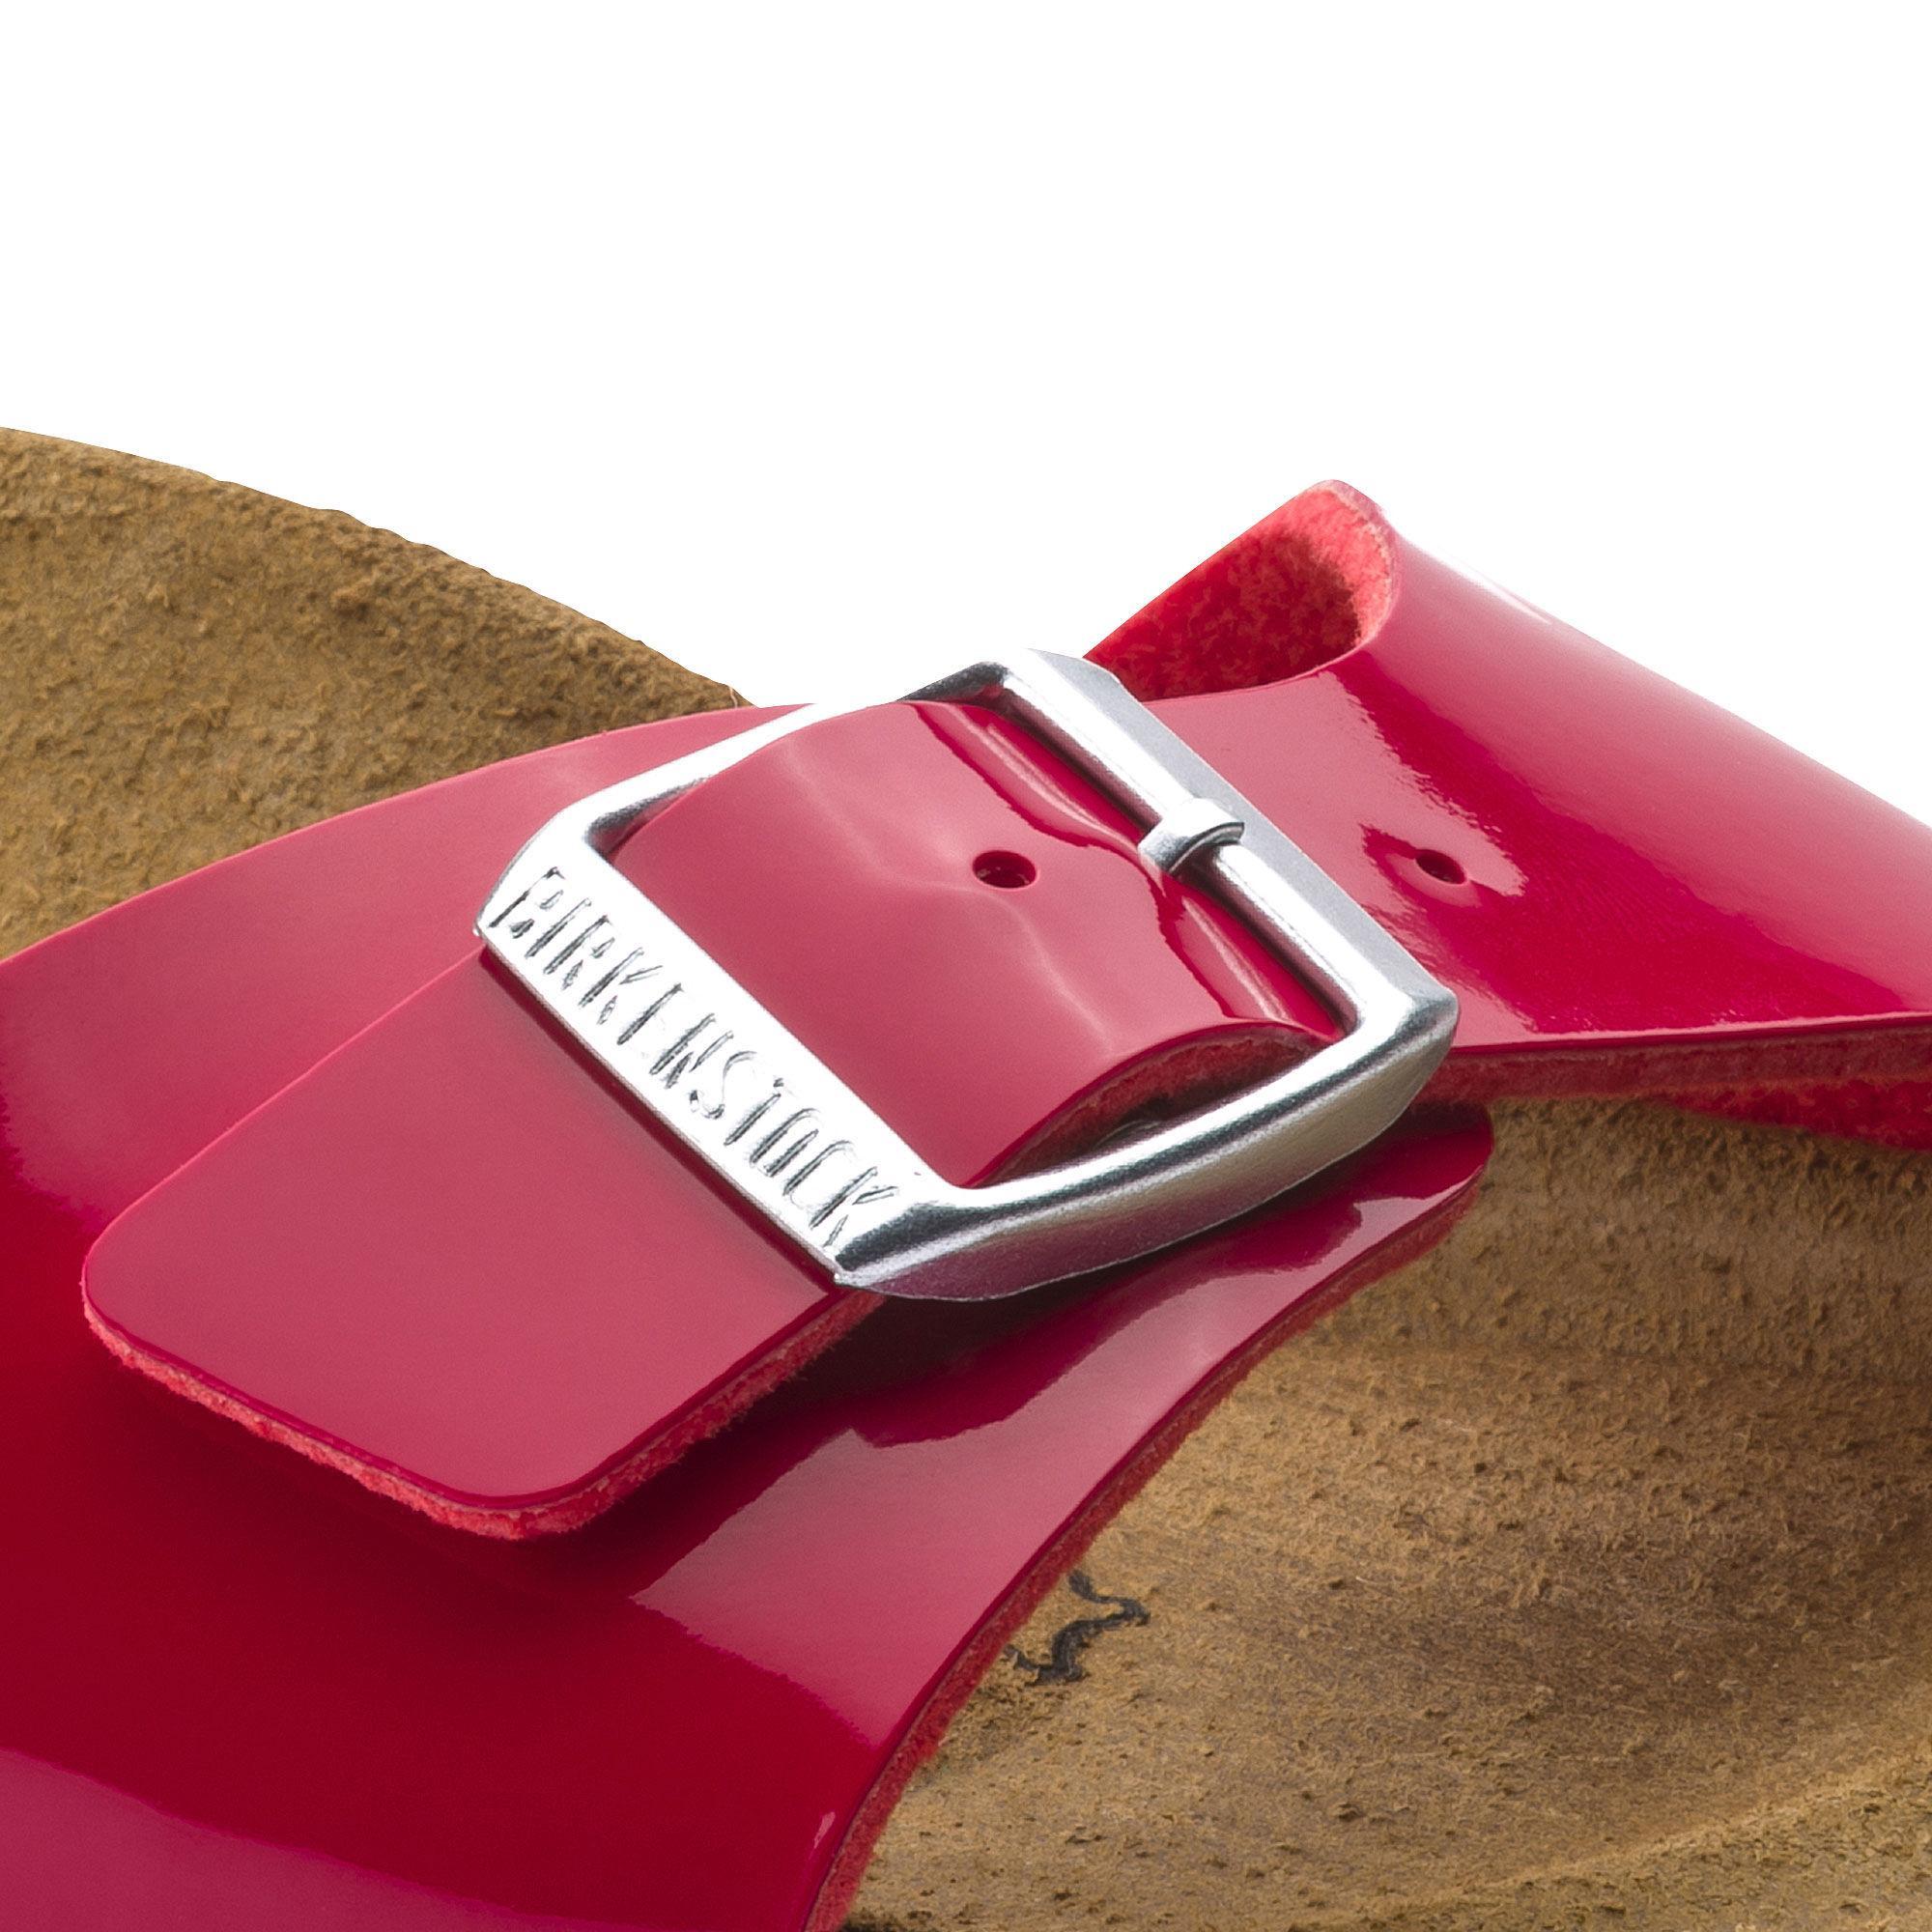 2399f38b6ccca Specifications of Birkenstocks Women Sandals Women Madrid Birko-Flor Patent  Tango Red Patent